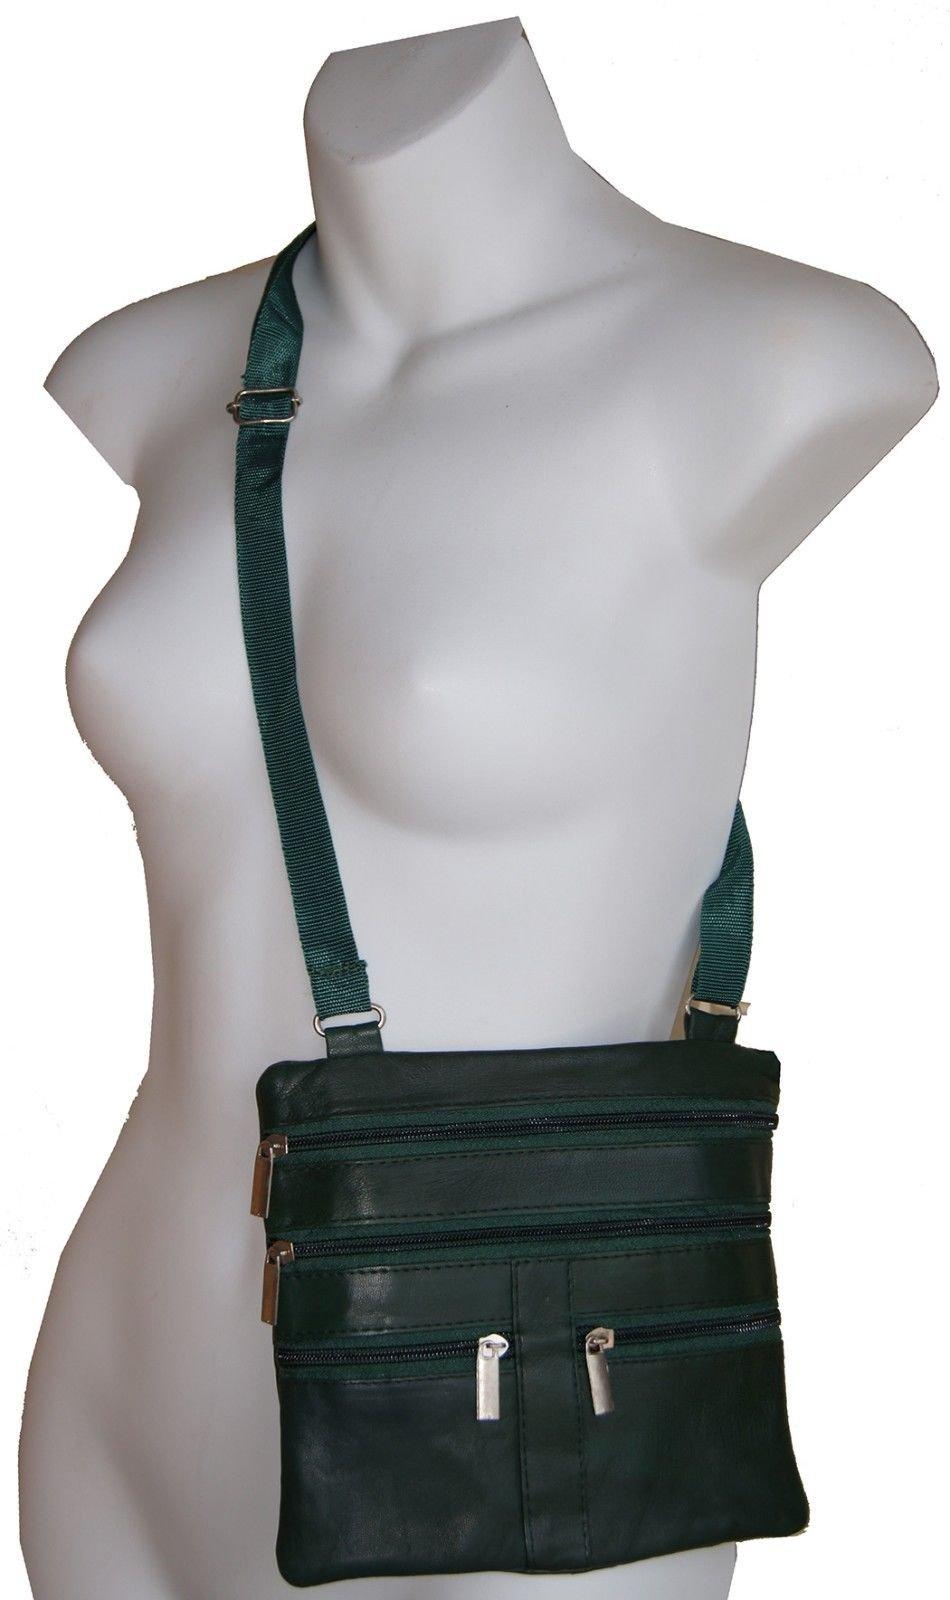 Ladies Genuine Leather Cross Boby 7''X7'' Messenger Bag 48'' Adjustable Strap Green